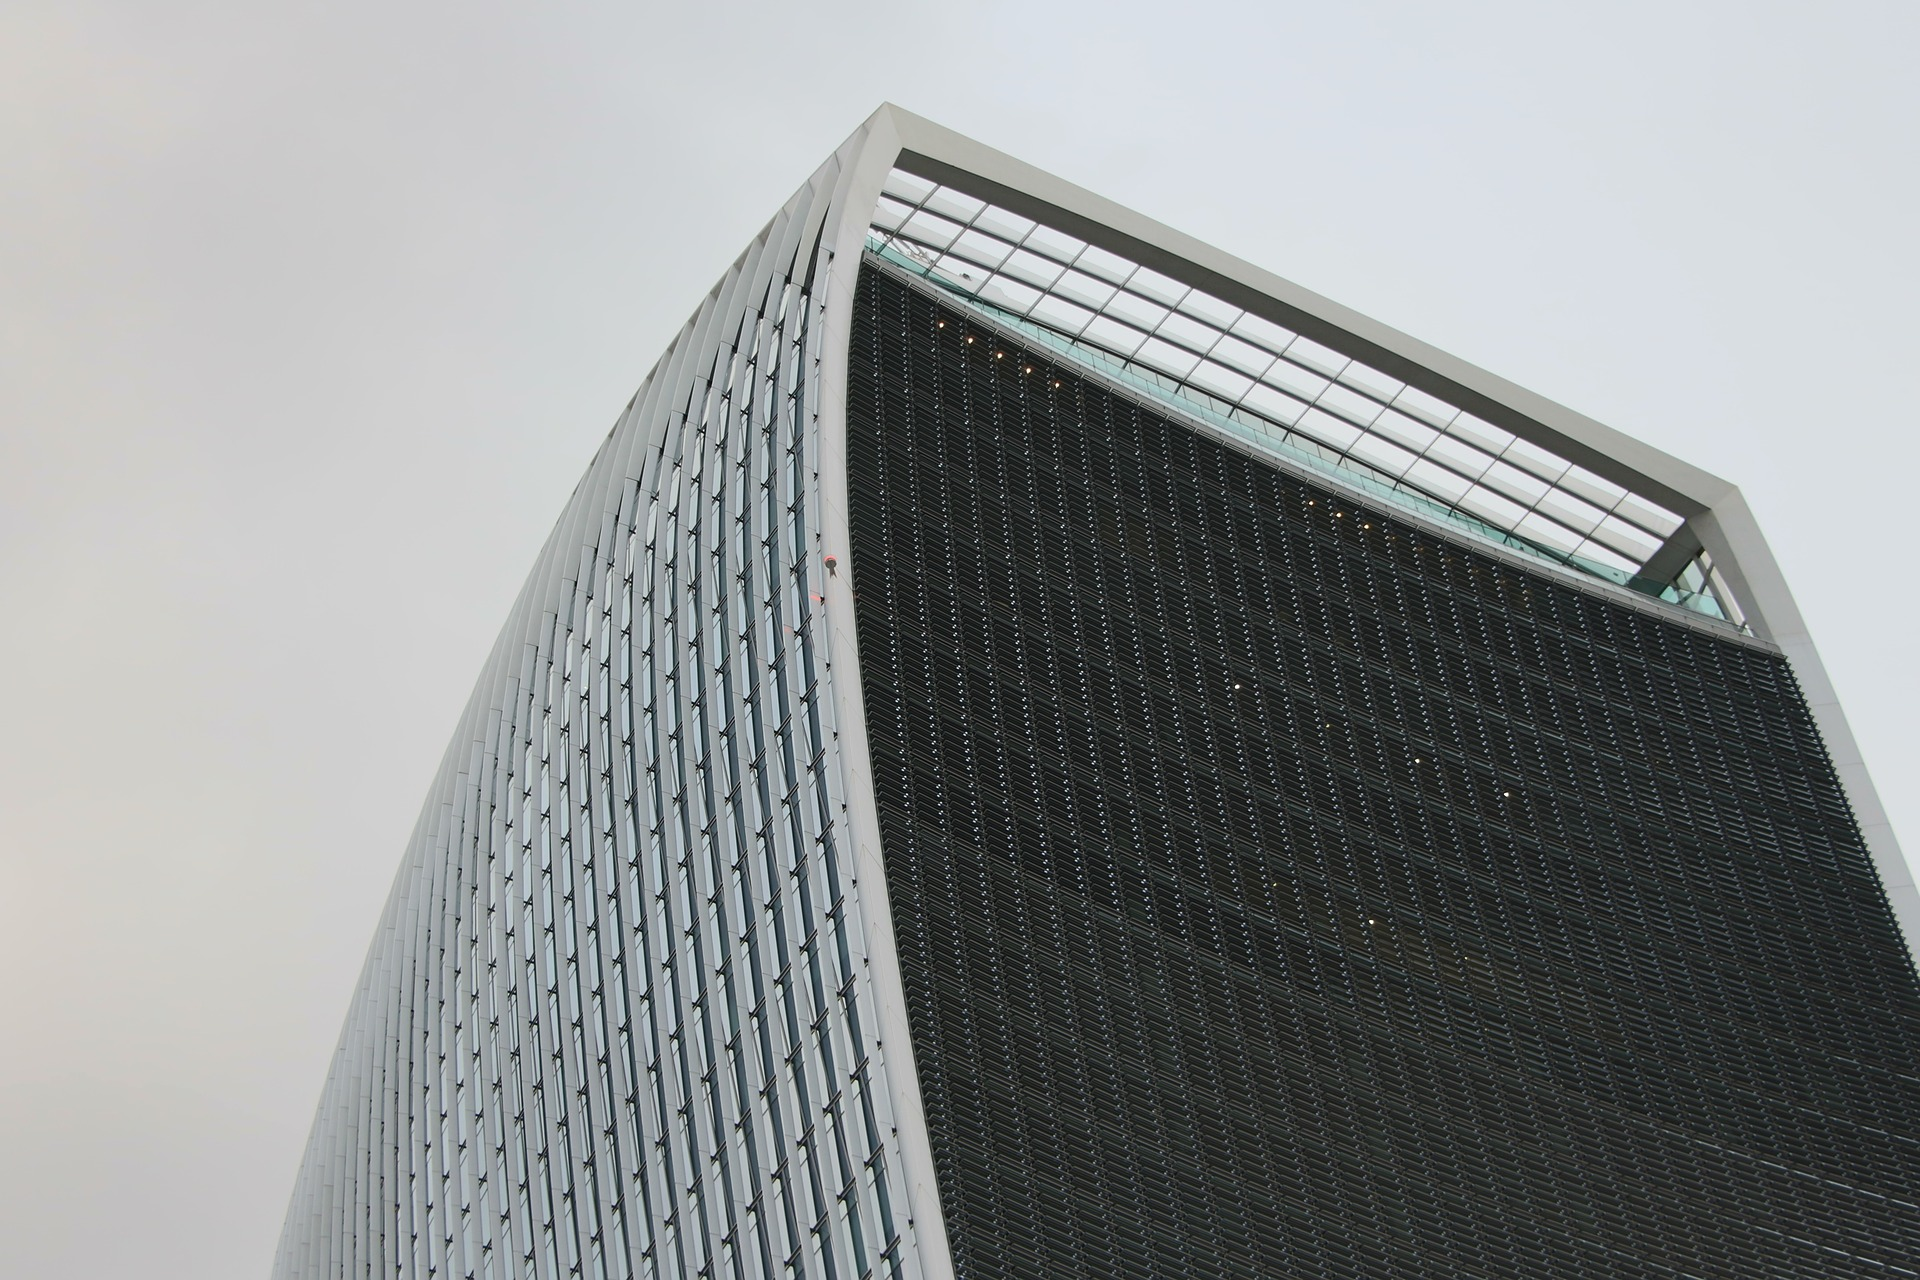 building-1031504_1920.jpg